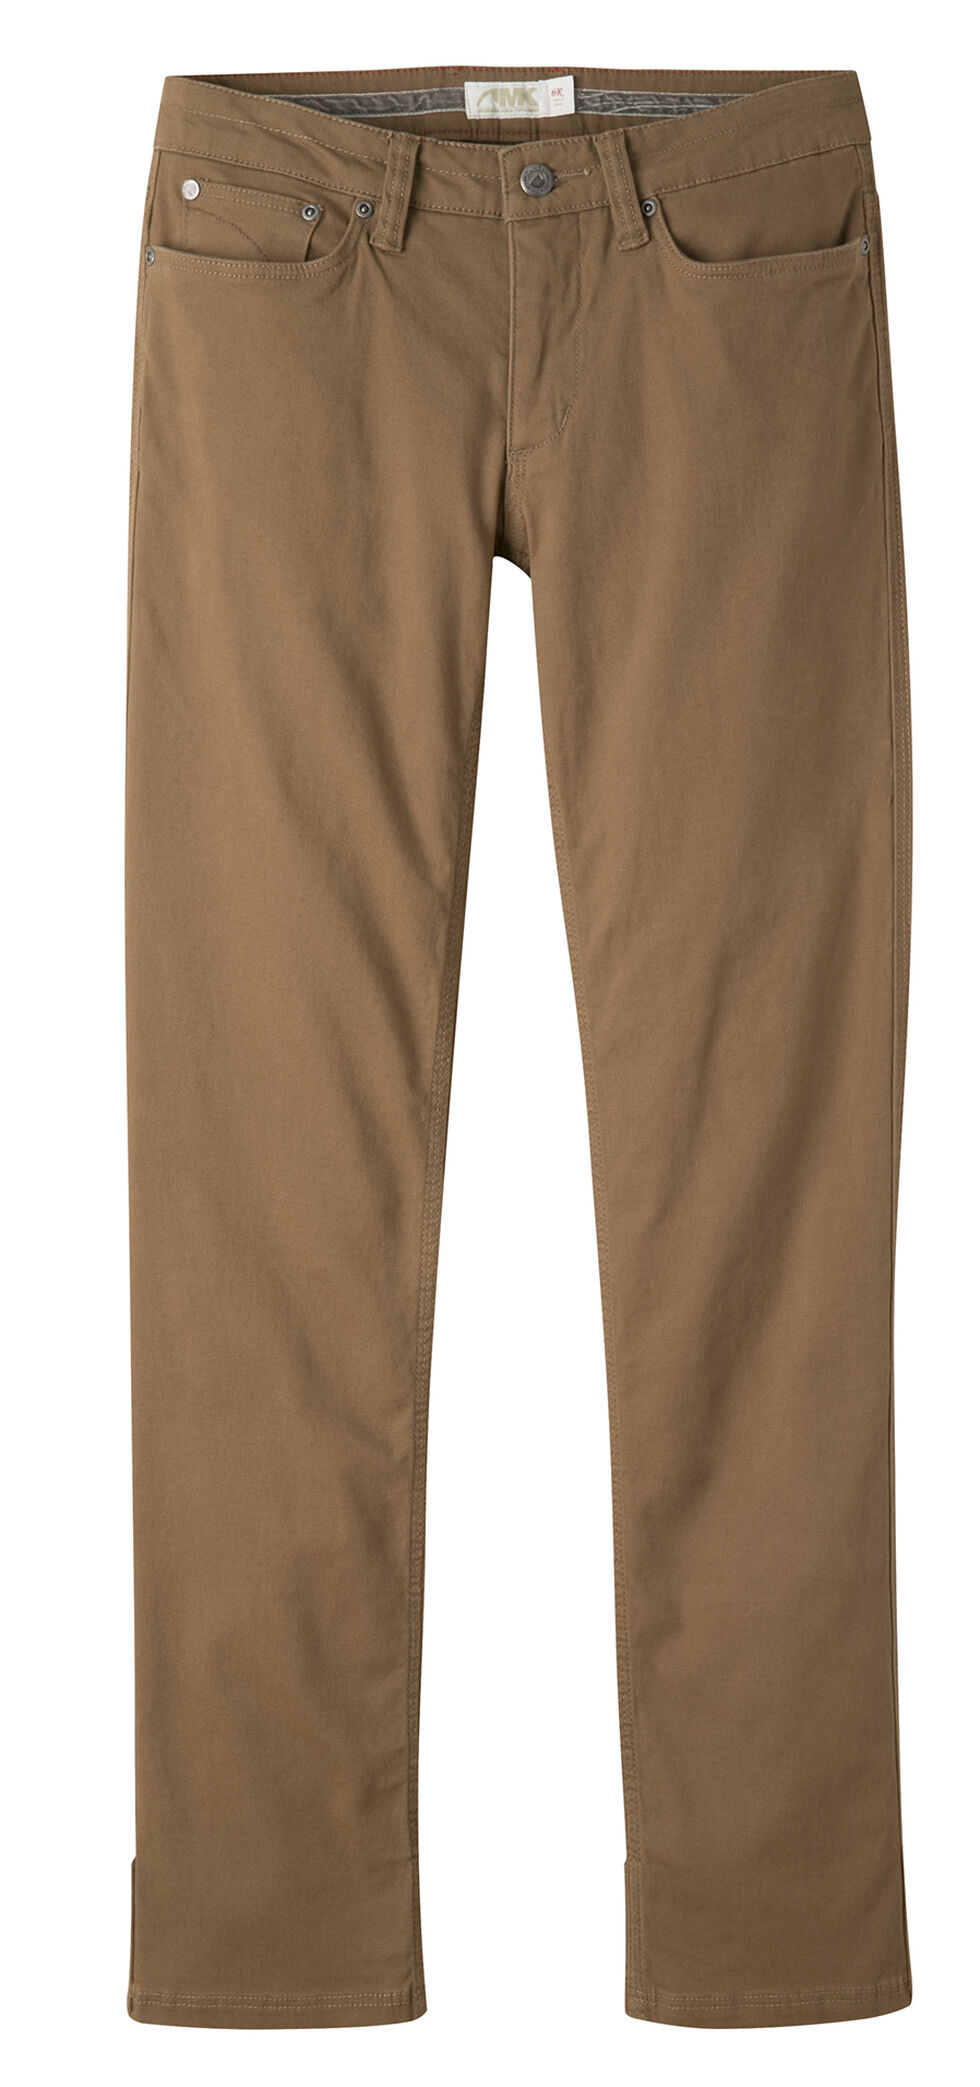 Mountain Khakis Women's Classic Fit Camber 106 Pants - Petite, Brown, hi-res